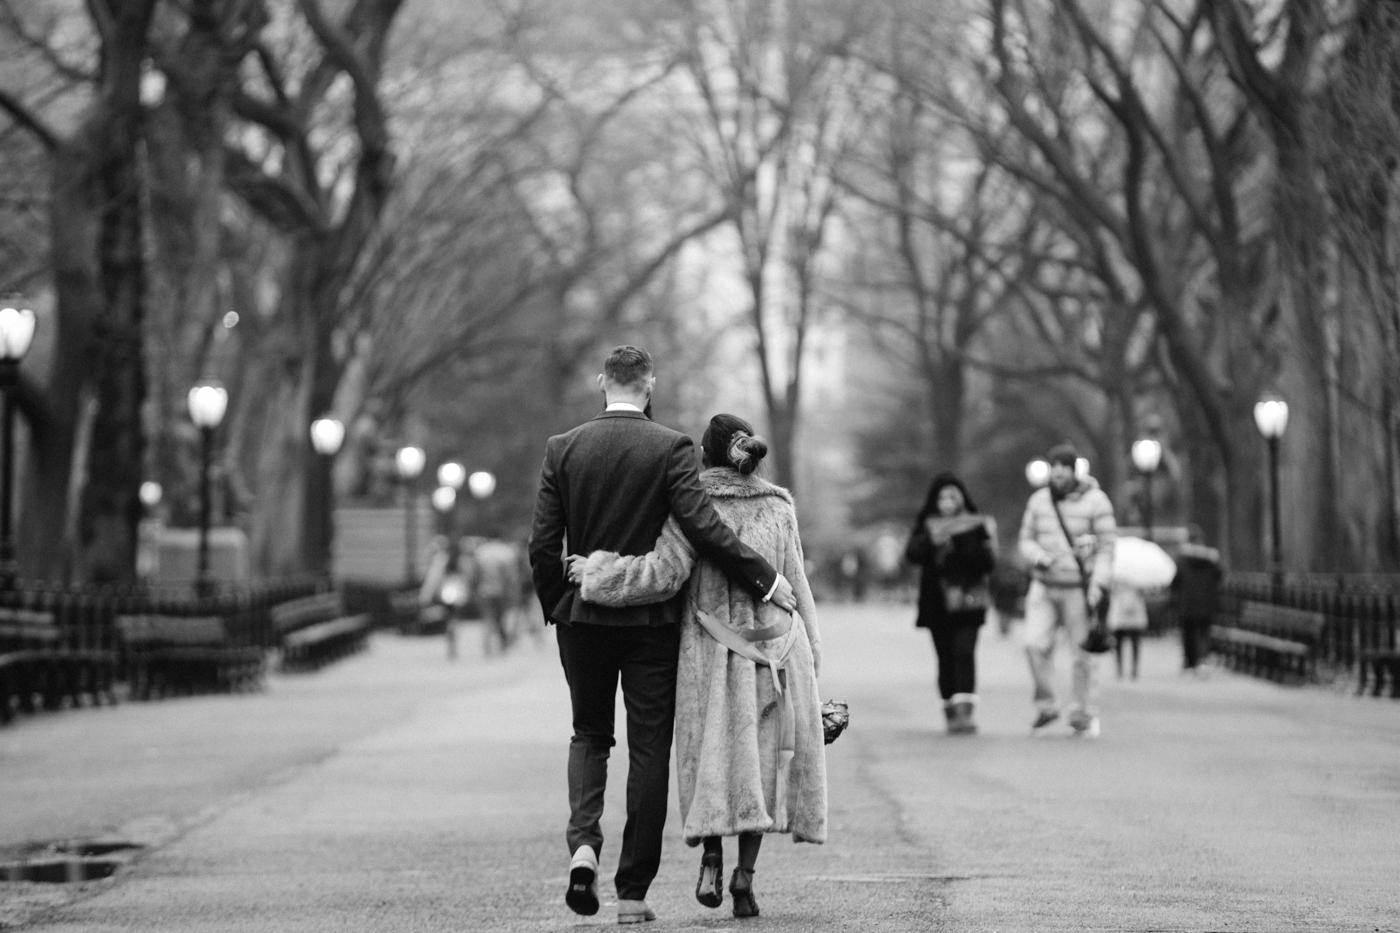 Central-park-wedding-by-Tanya-Isaeva-113.jpg